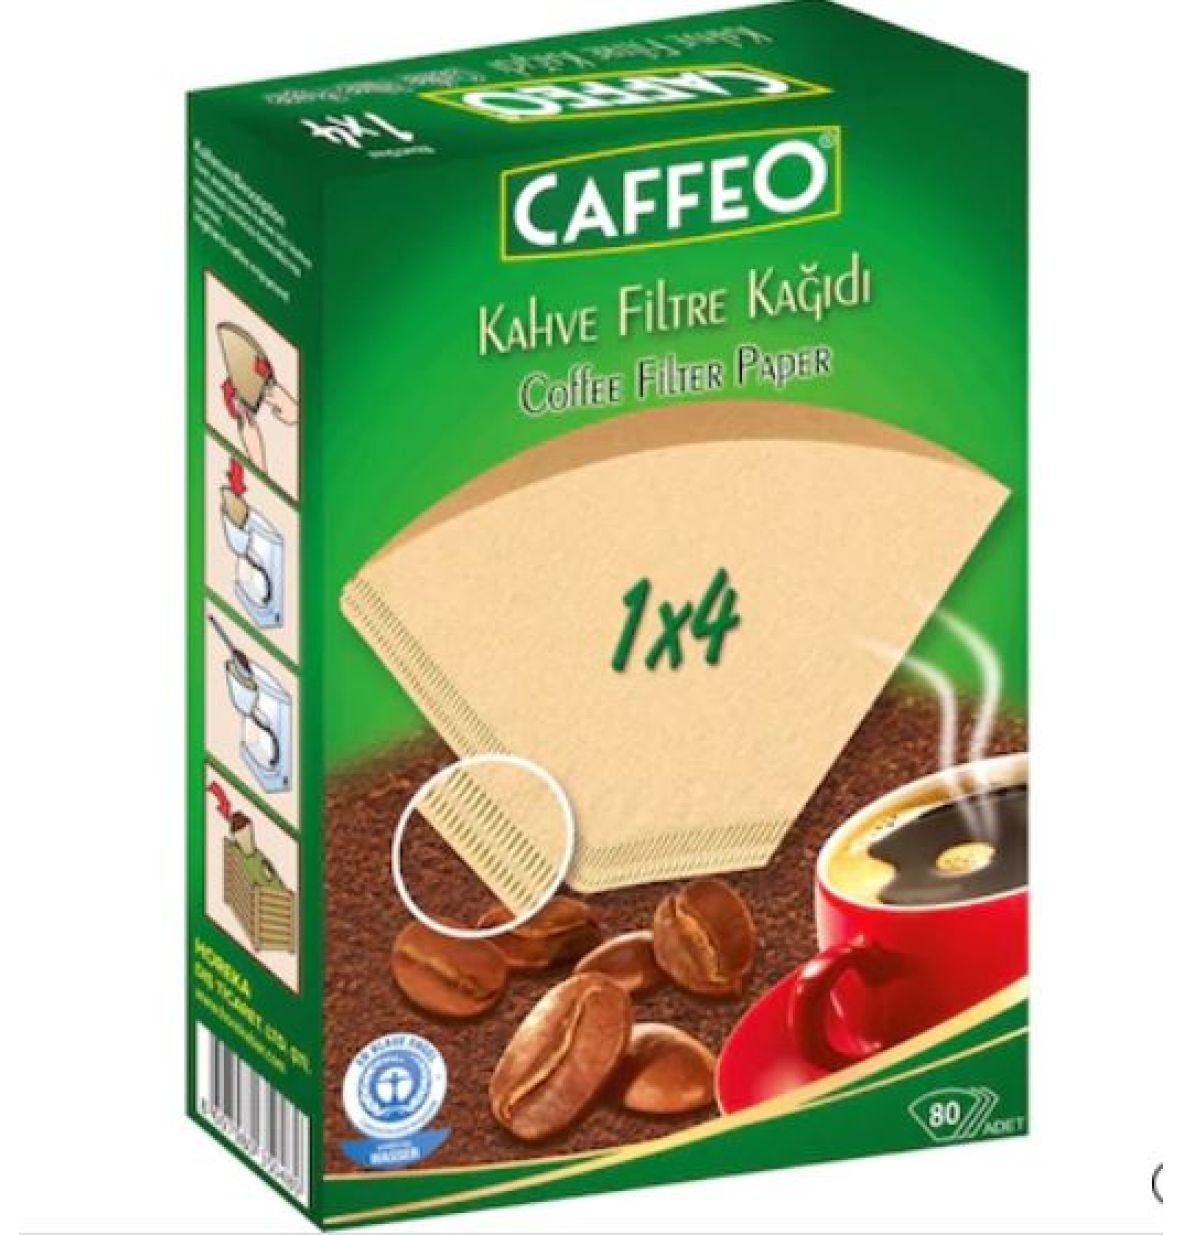 CAFFEO FİLTRE KAHVE KAĞIDI  1x4